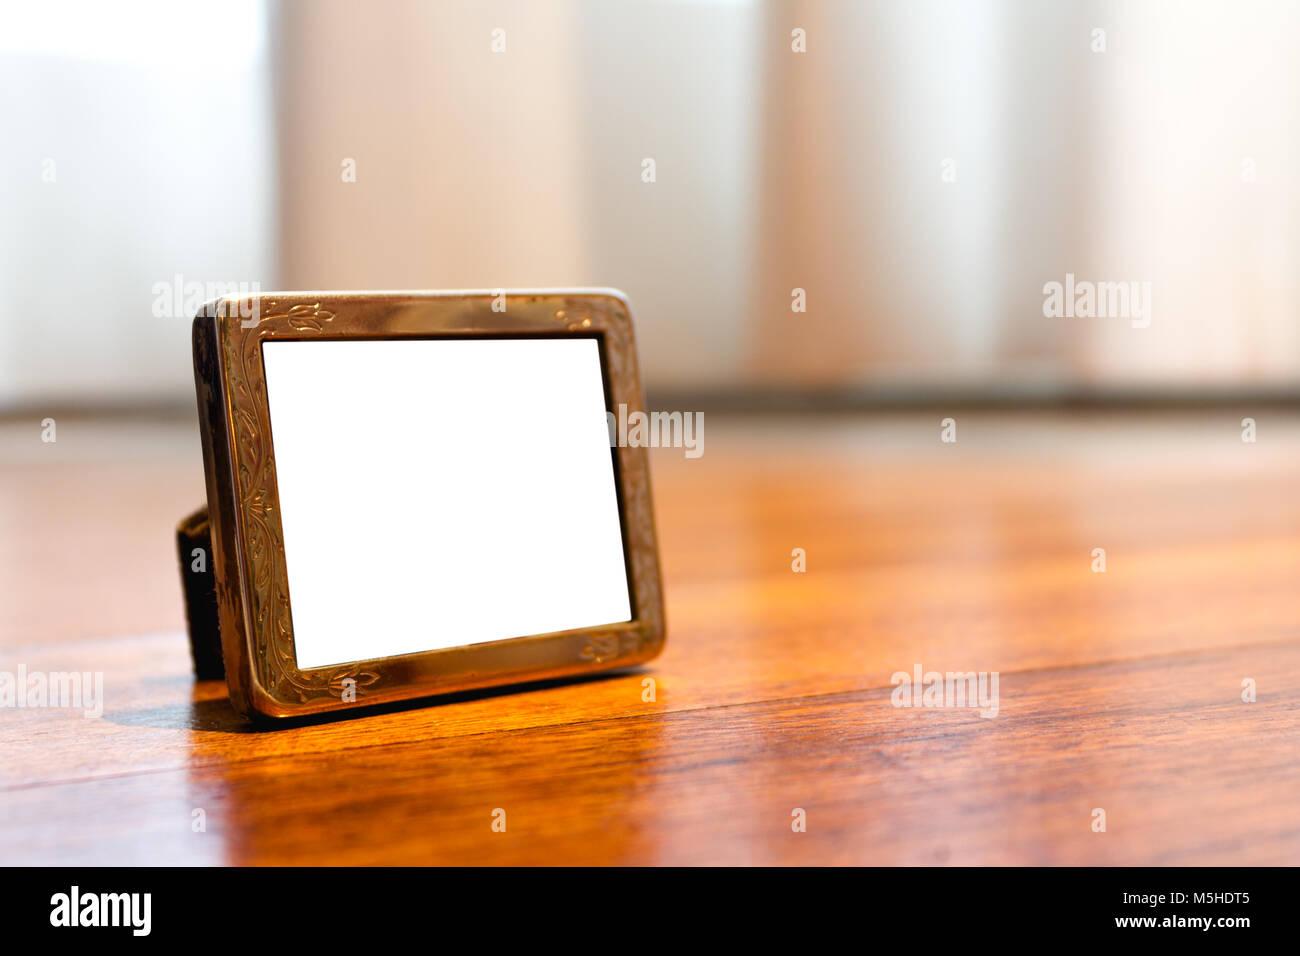 Miniature Silver Photo Frame Mock up Stock Photo